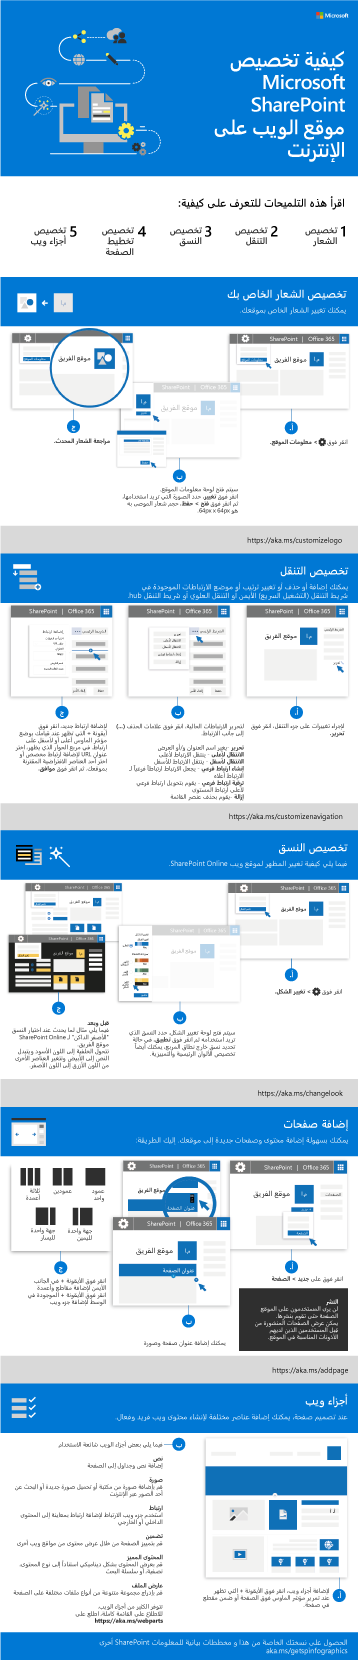 تخصيص موقع SharePoint